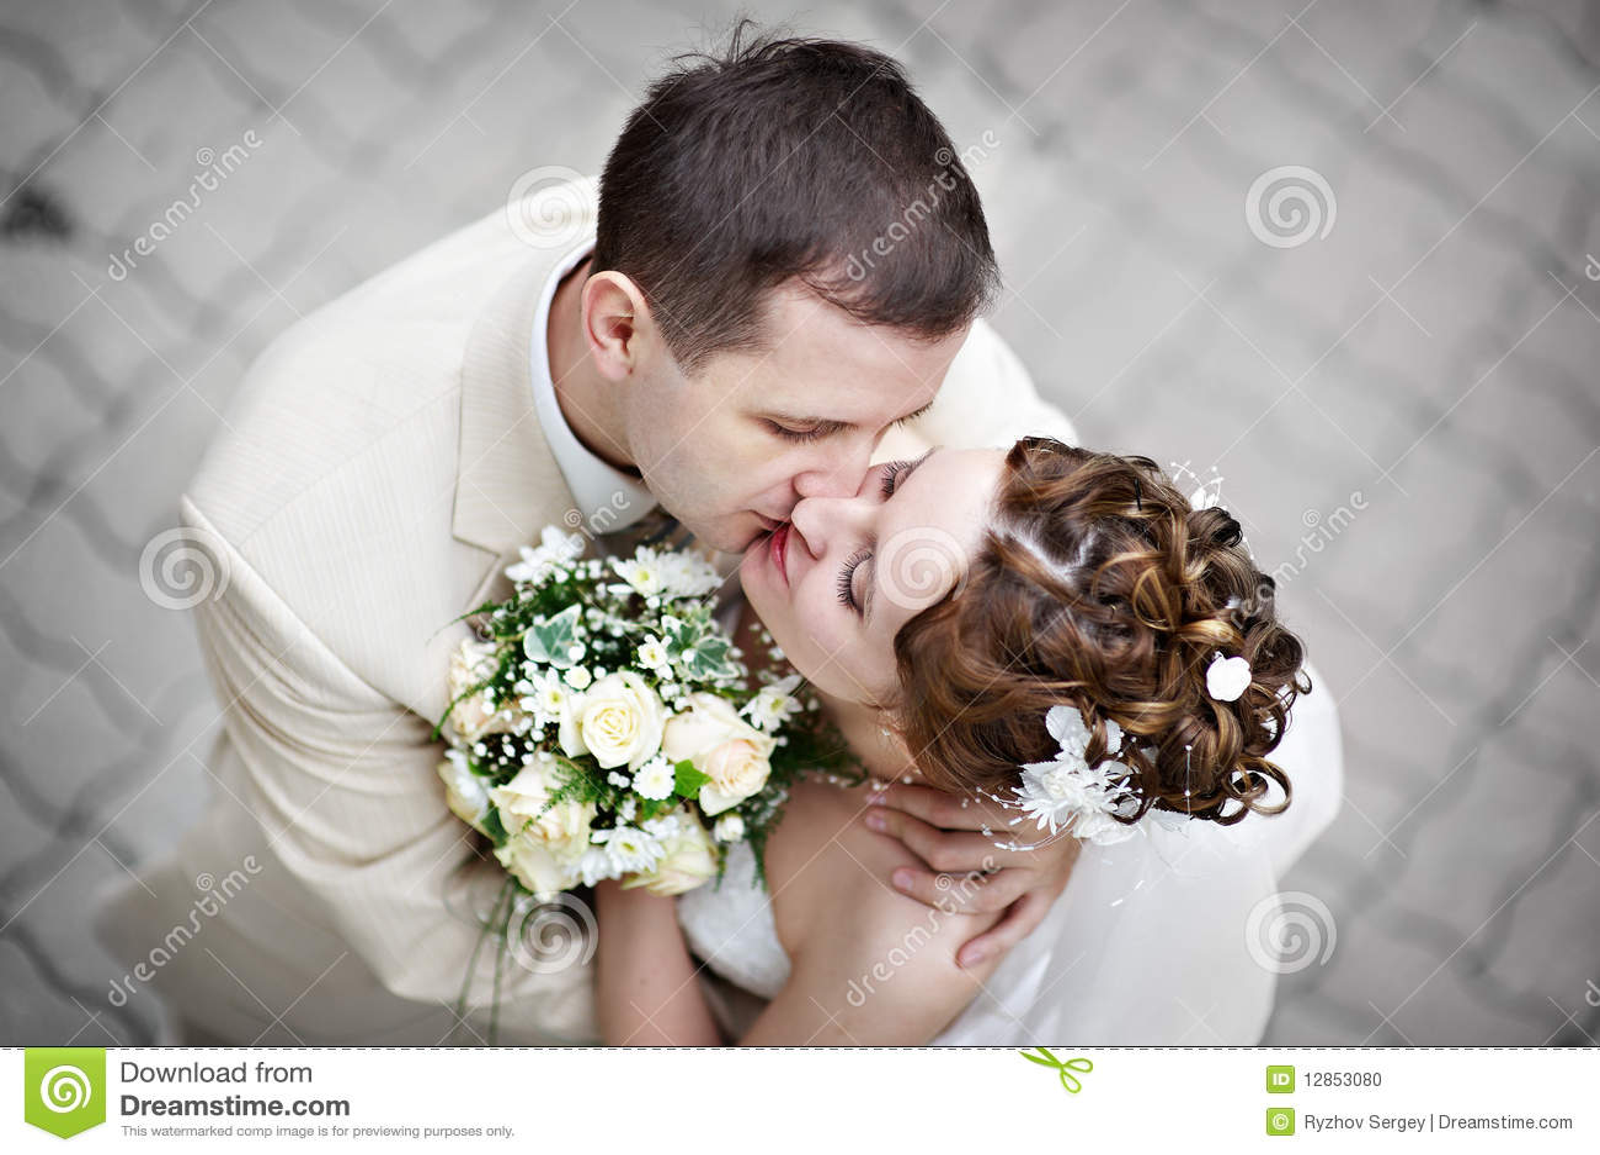 romantic kiss bride and groom at wedding walk stock photo - image